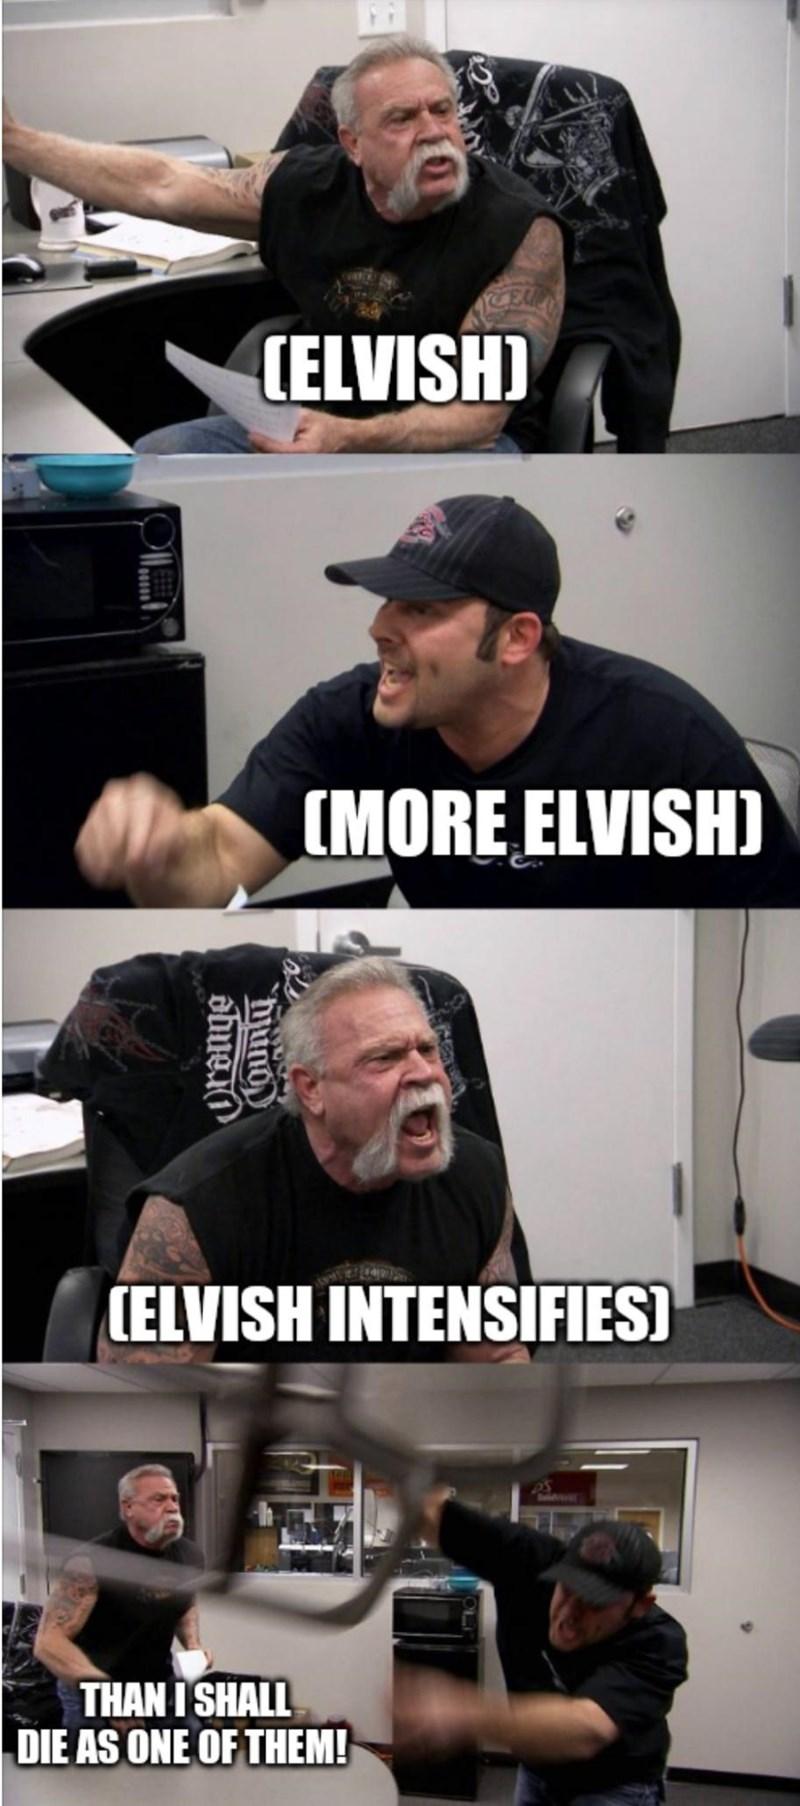 Muscle - CELVISH) (MORE ELVISH) (ELVISH INTENSIFIES) e5 THAN I SHALL DIE AS ONE OF THEM! Lountu